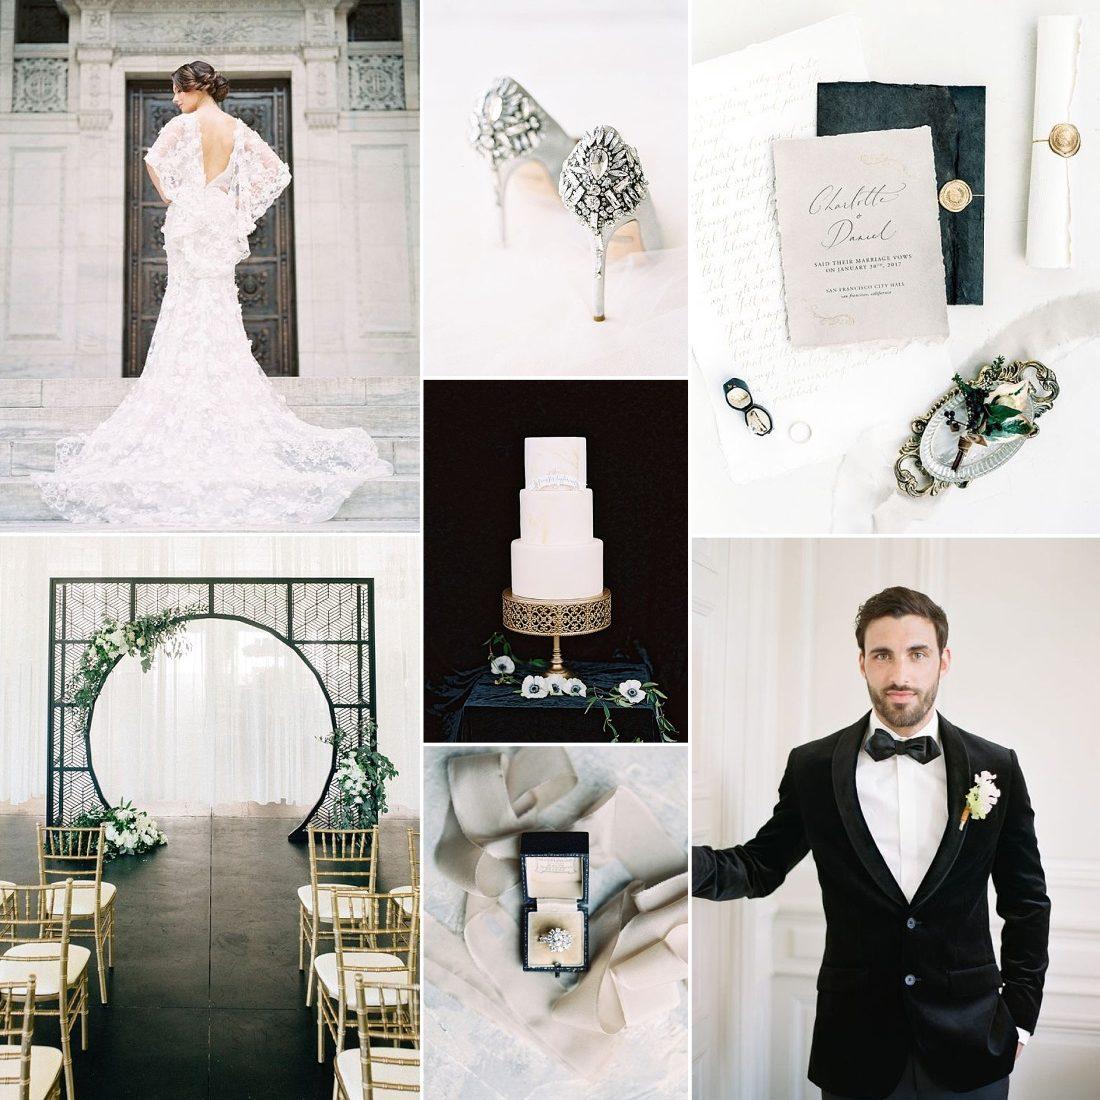 https://chicvintagebrides.com/wp-content/uploads/2019/02/Midwinter-Monochrome-Wedding-Inspiration-Board-1-e1550626070313.jpg